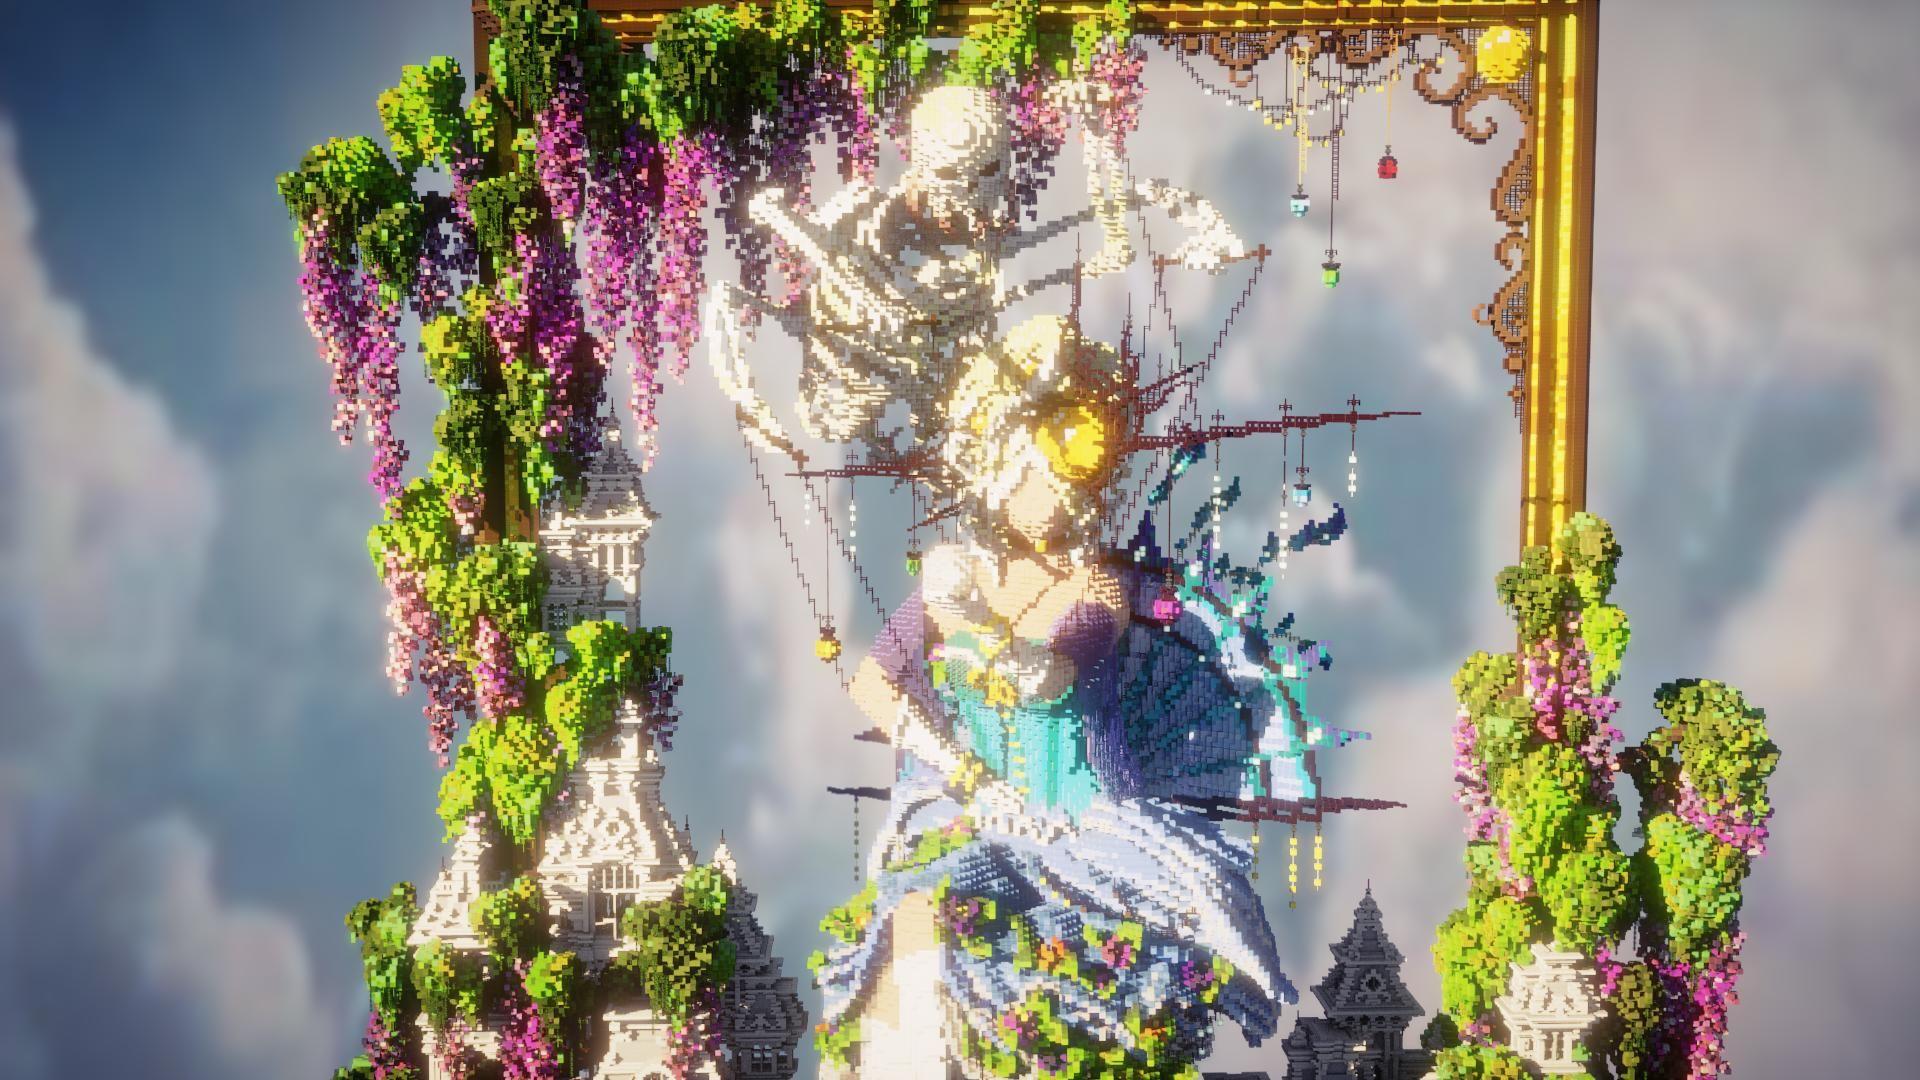 Artista Do Minecraft Faz Lindas Esculturas Dentro Do Jogo Artistas Esculturas Obras De Arte